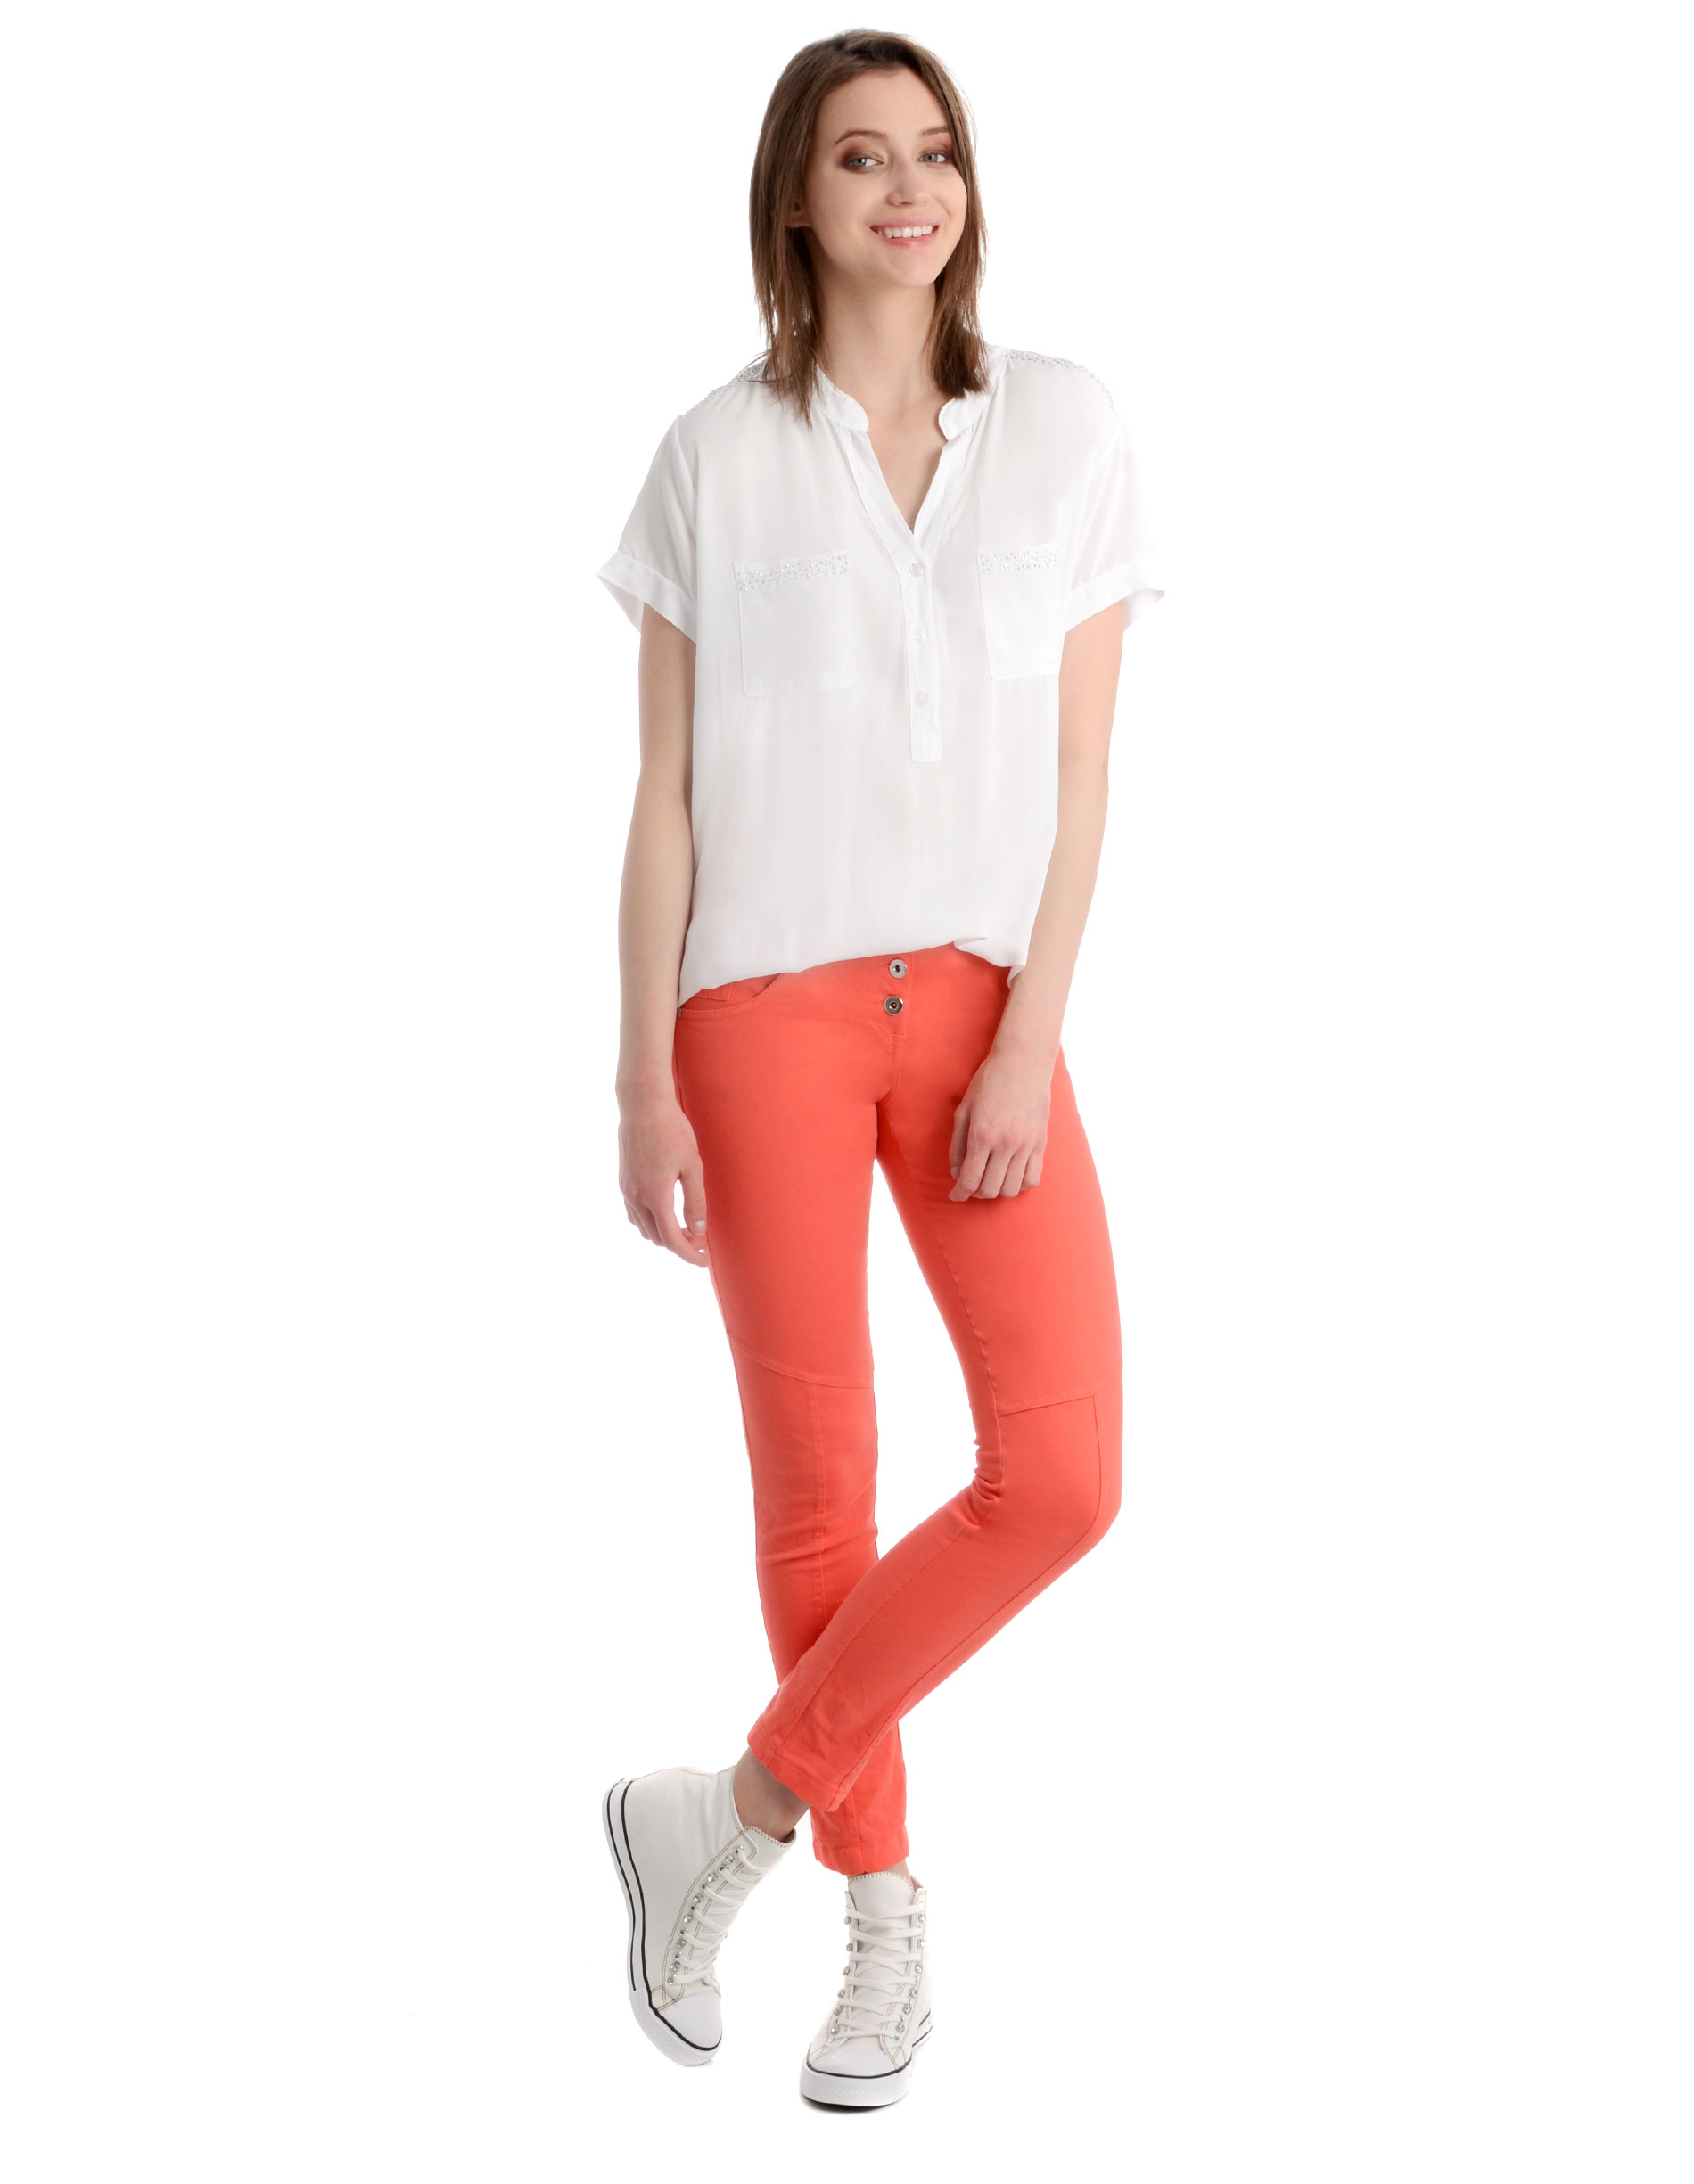 Spodnie - 34-4013 CORAL - Unisono